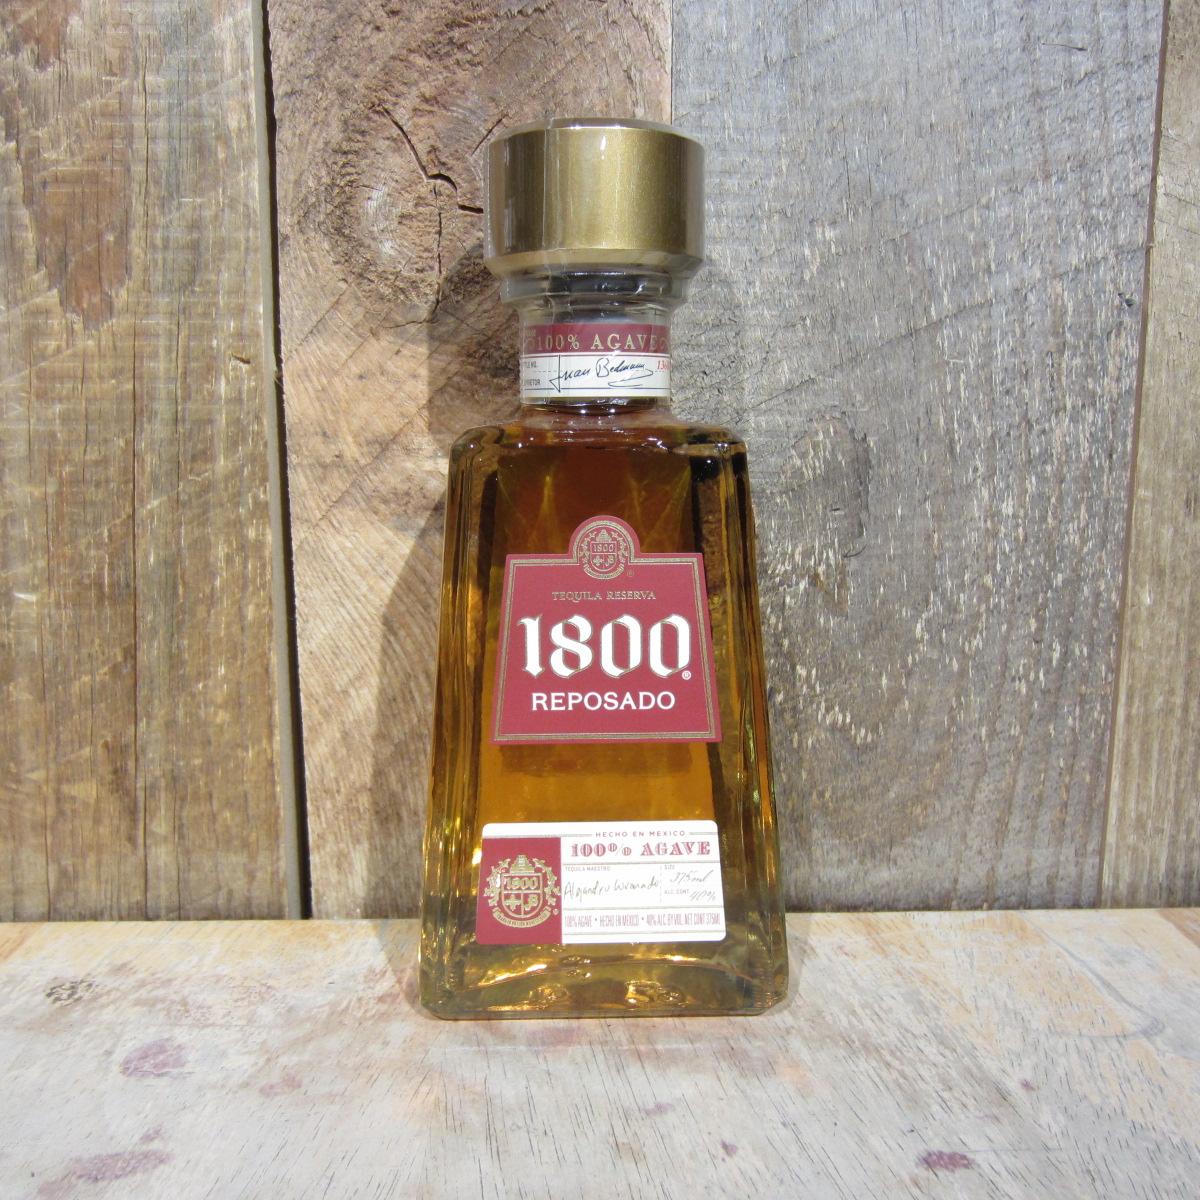 1800 Reposado Tequila 375ml (Half Size Btls)